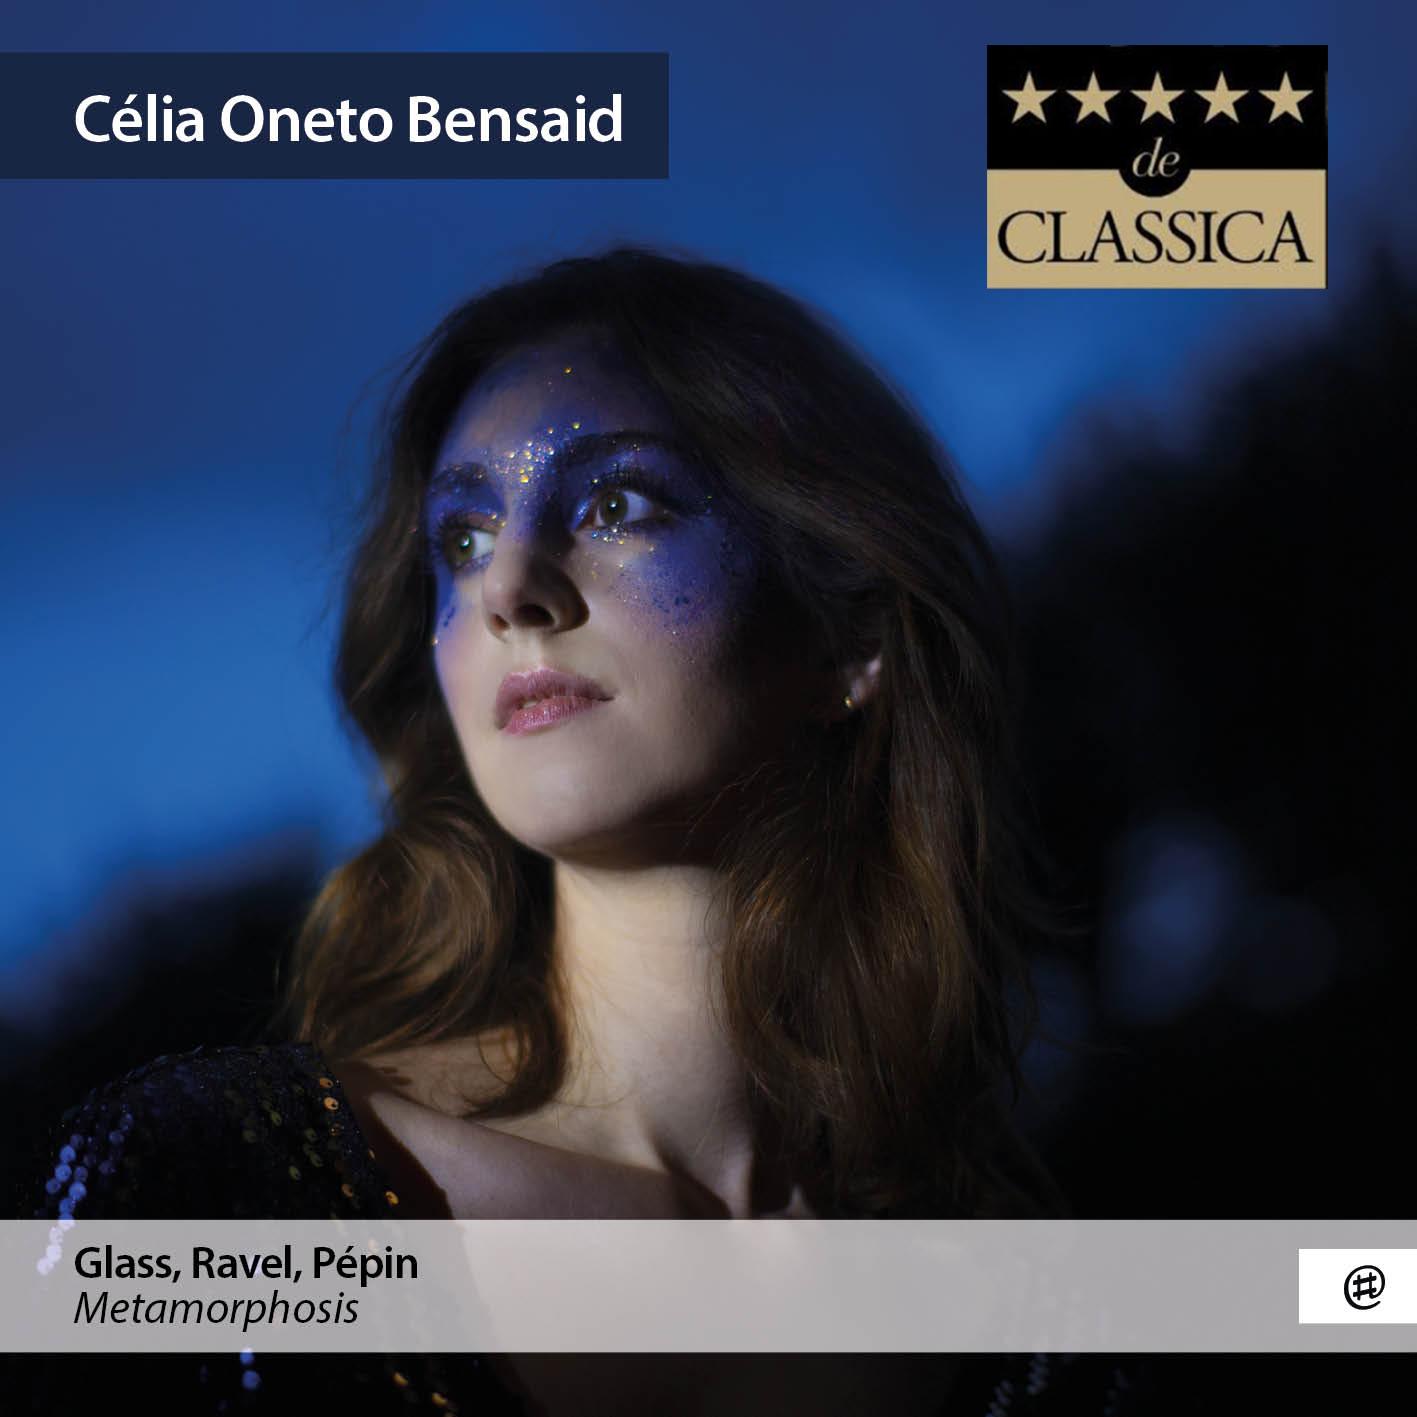 Metamorphosis | Glass, Ravel, Pépin - Célia Oneto Bensaid